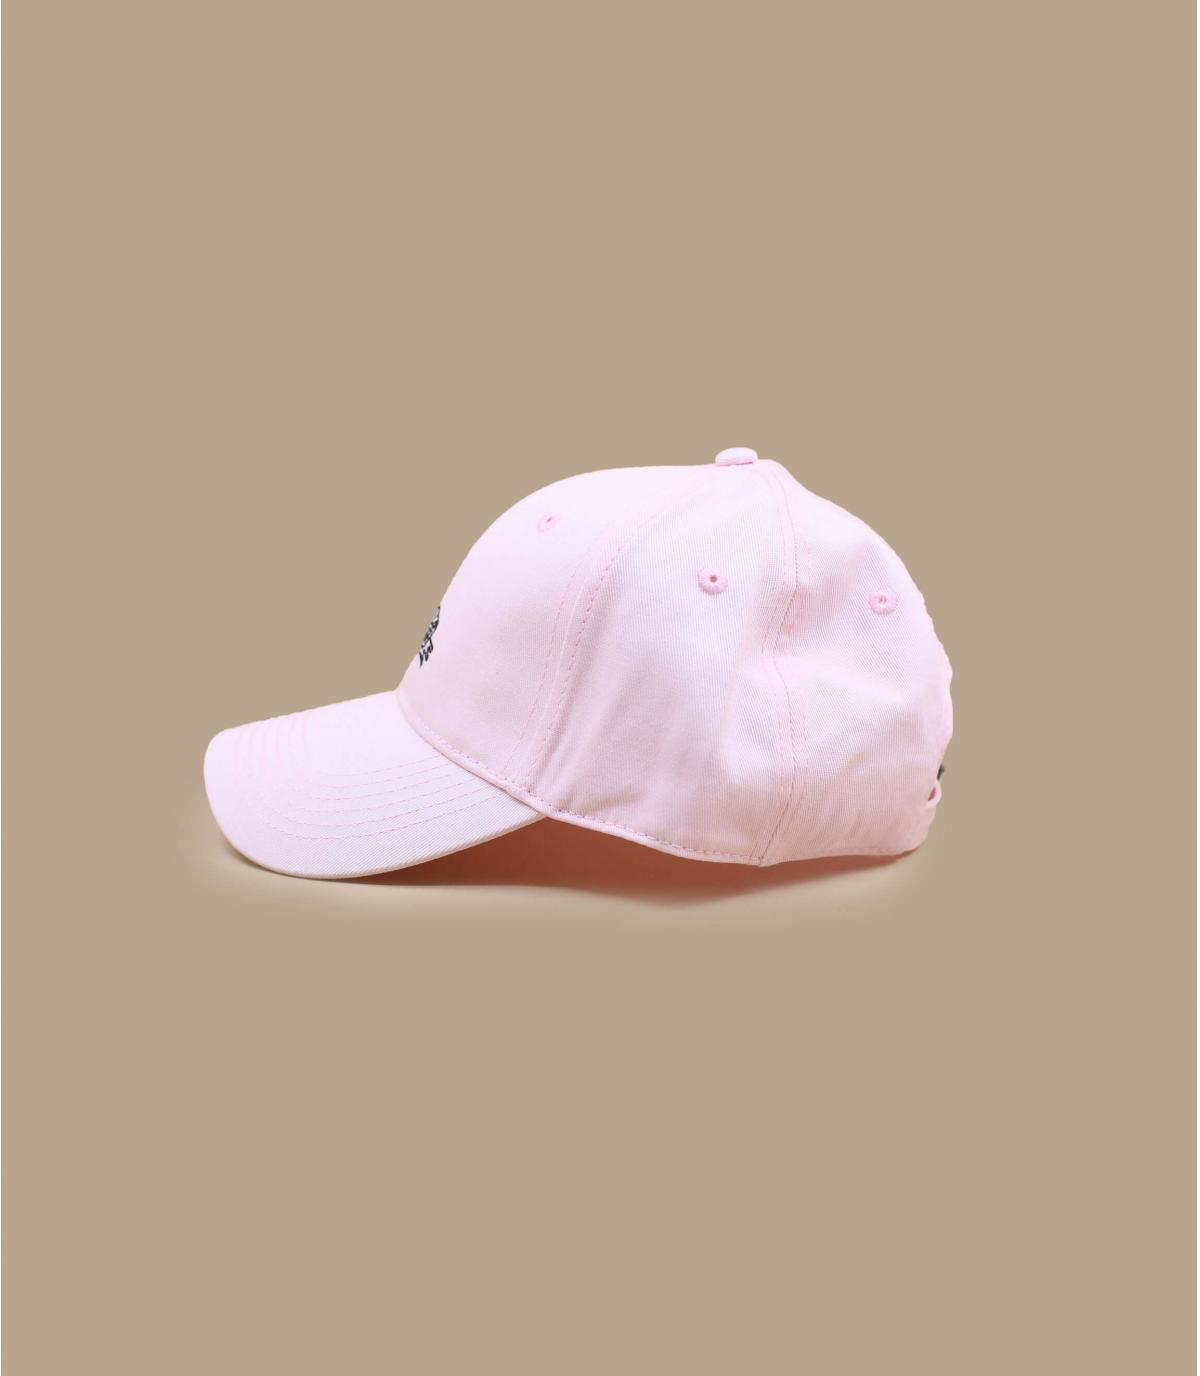 Detalles Chosen One Curved Cap pale pink imagen 3